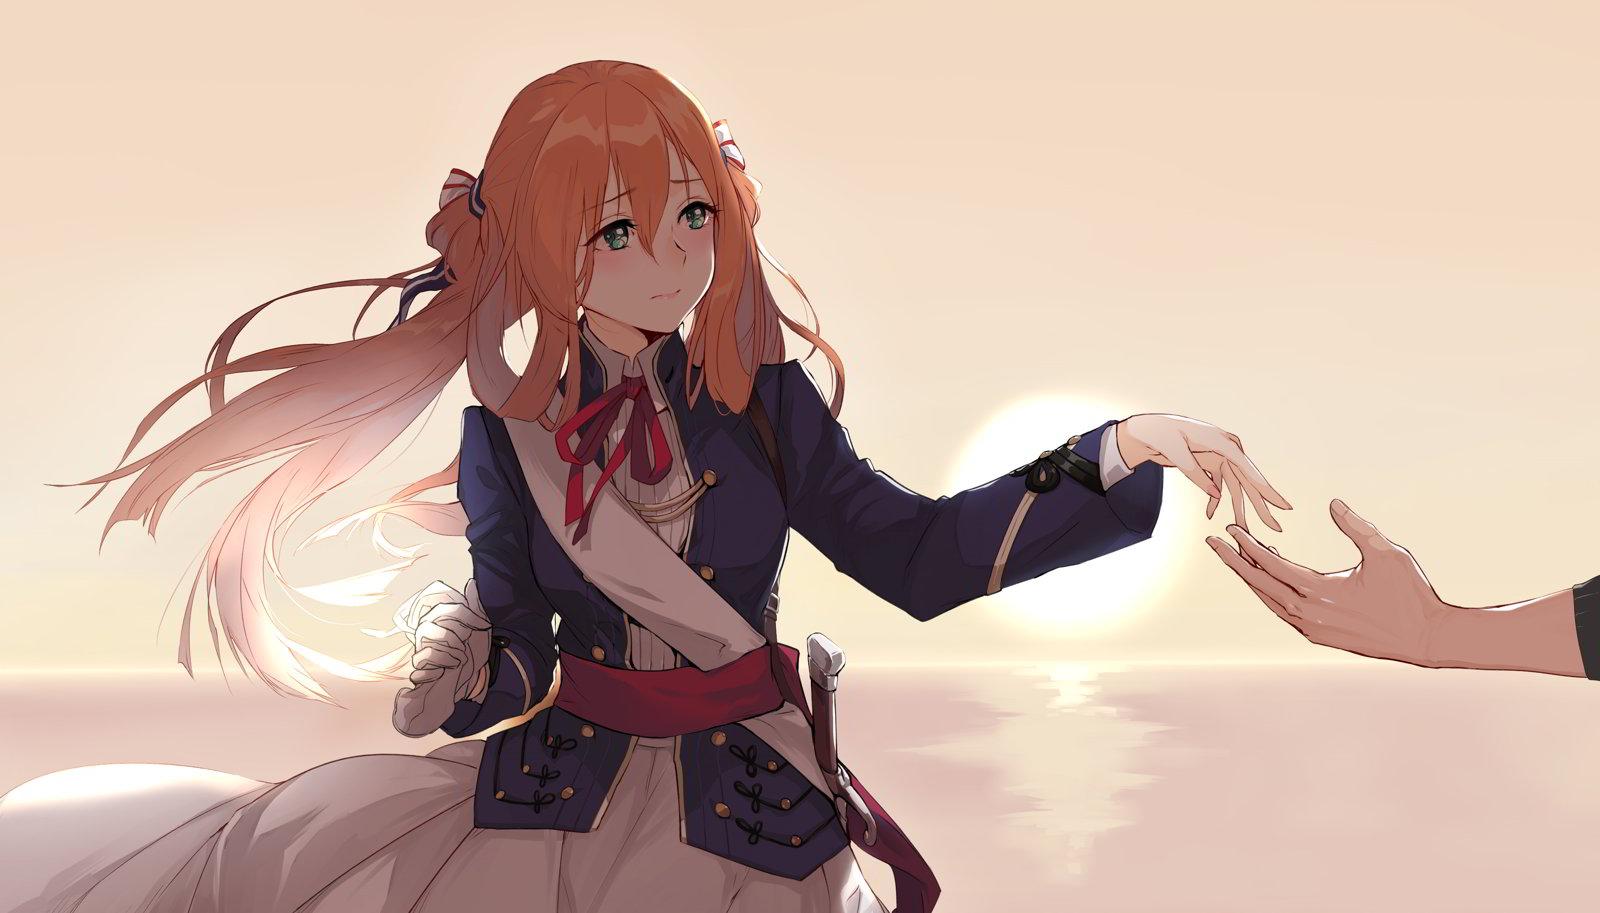 hinh nen anime girl dang yeu 12